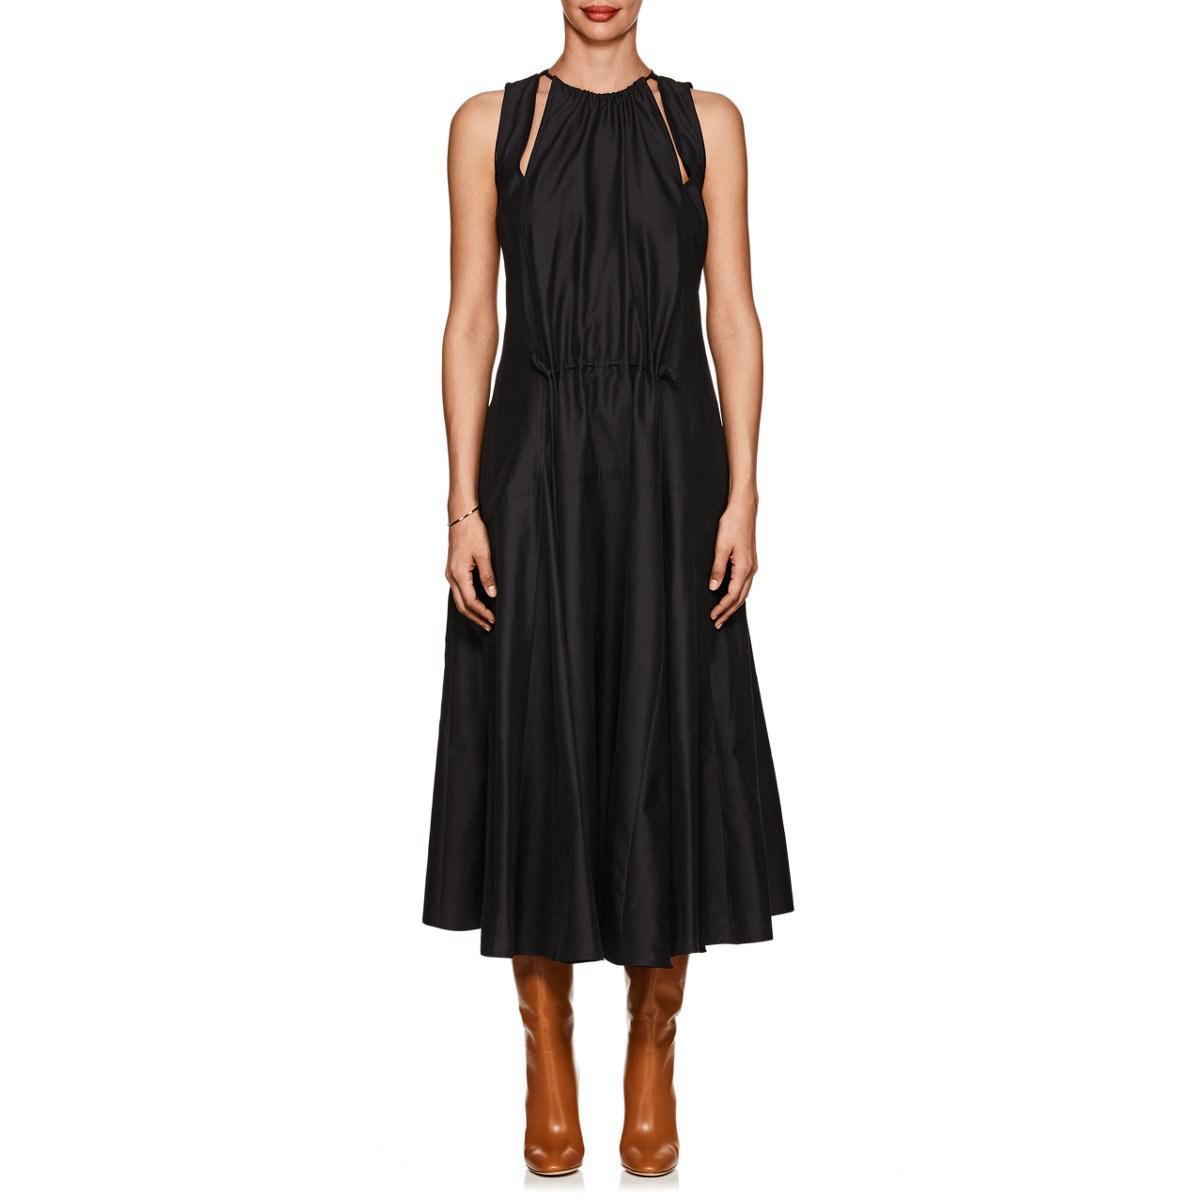 ff2ca05833 Lyst - Derek Lam Cotton Poplin Tank Dress in Black